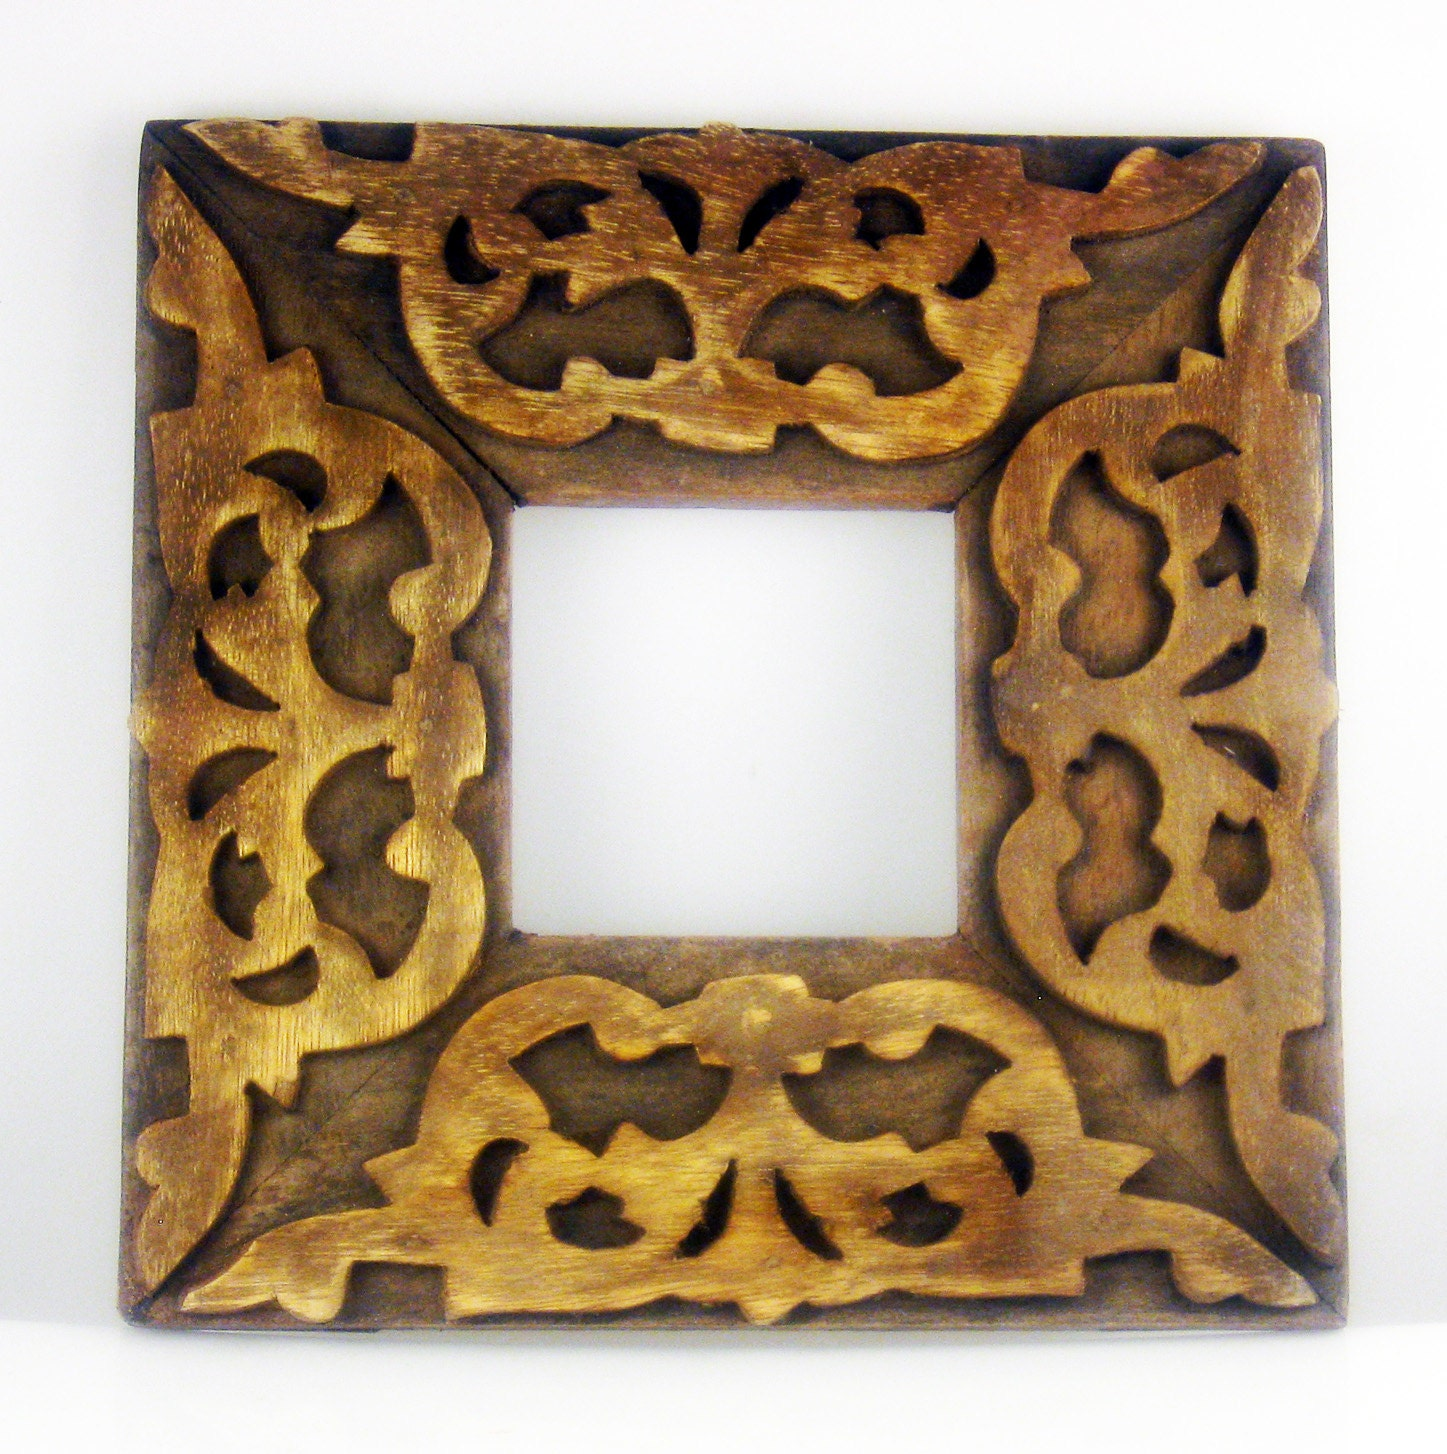 Vintage indonesian batik design hand carved wood picture frame sold by designstampingtools jeuxipadfo Image collections